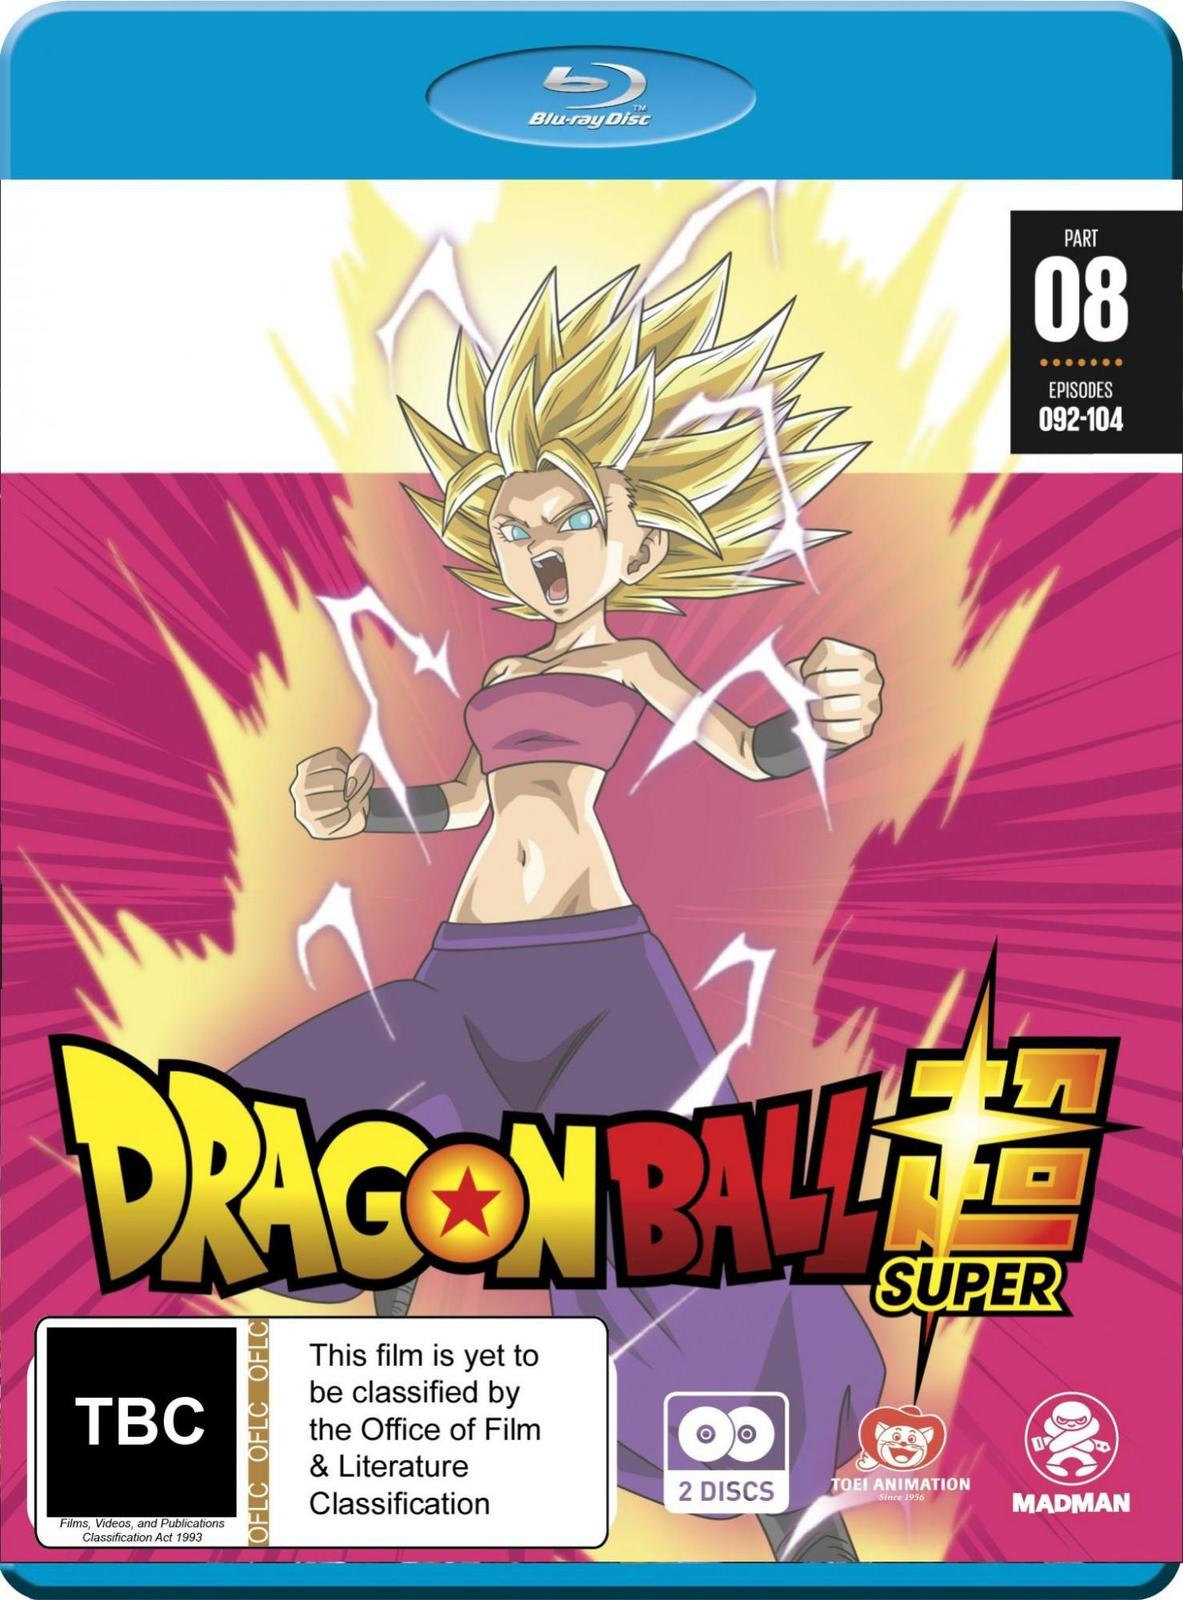 Dragon Ball Super - Part 8 (Eps 92-104) on Blu-ray image